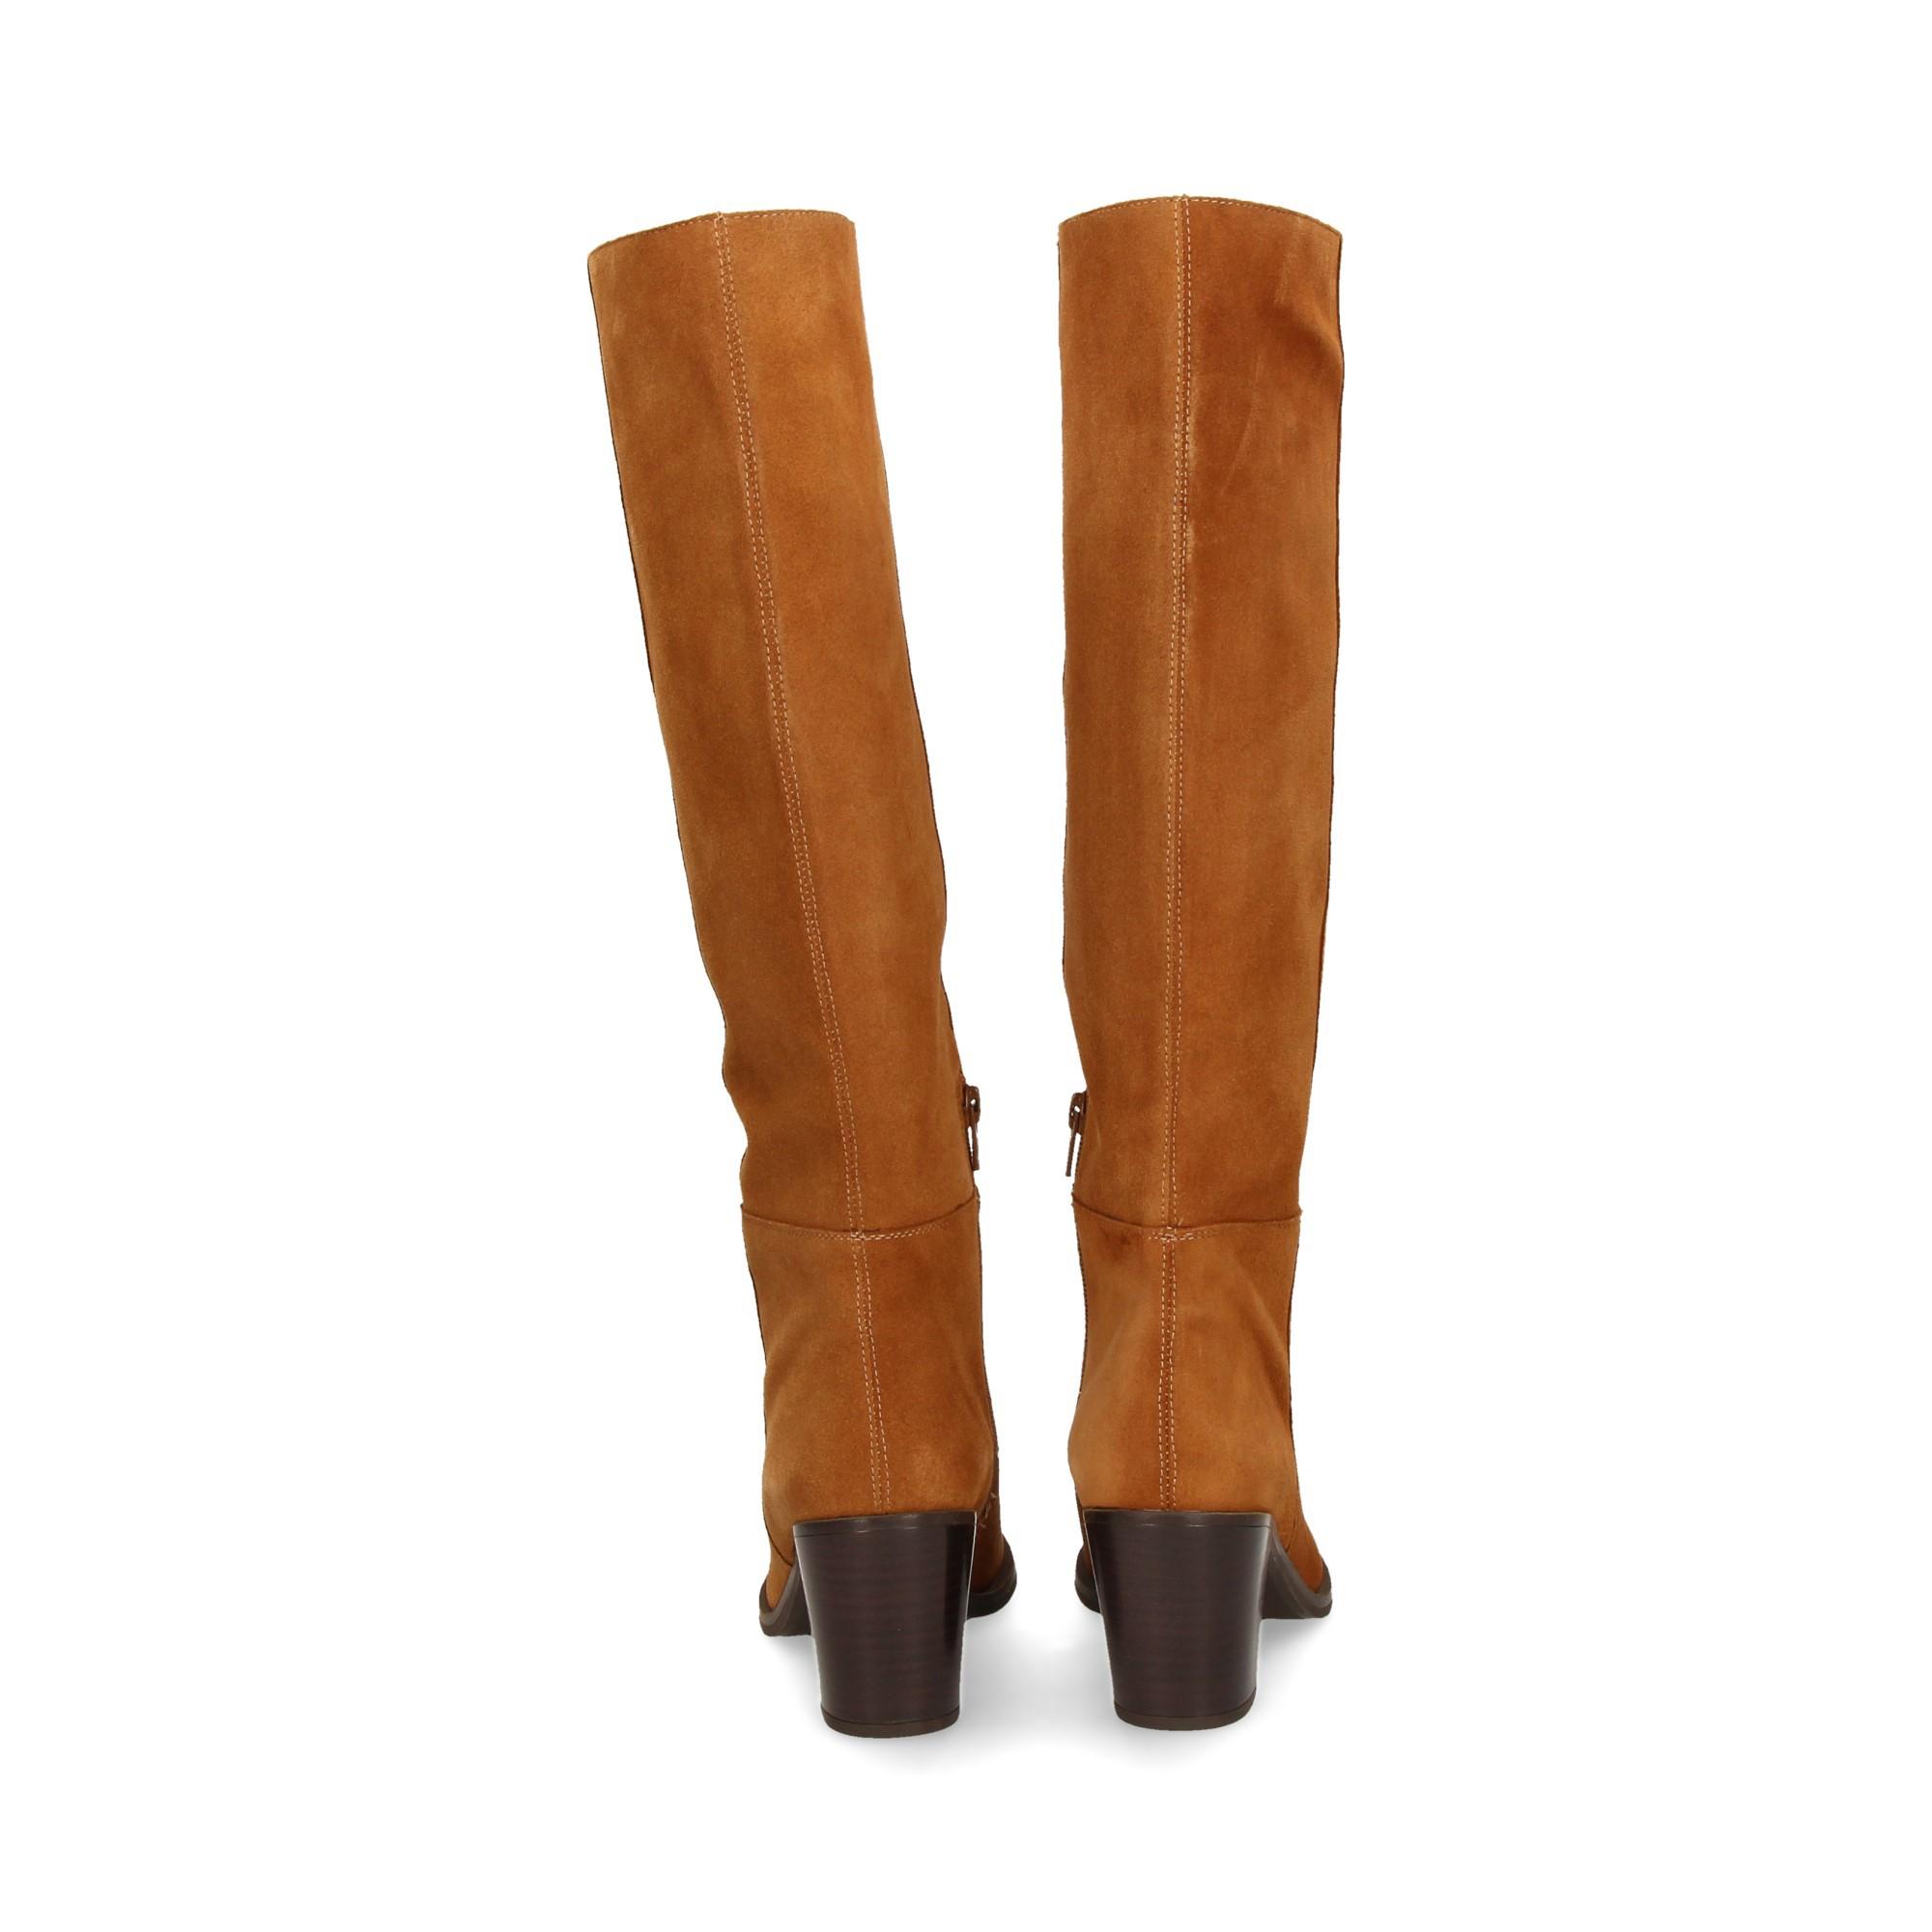 camurca-botas-de-couro